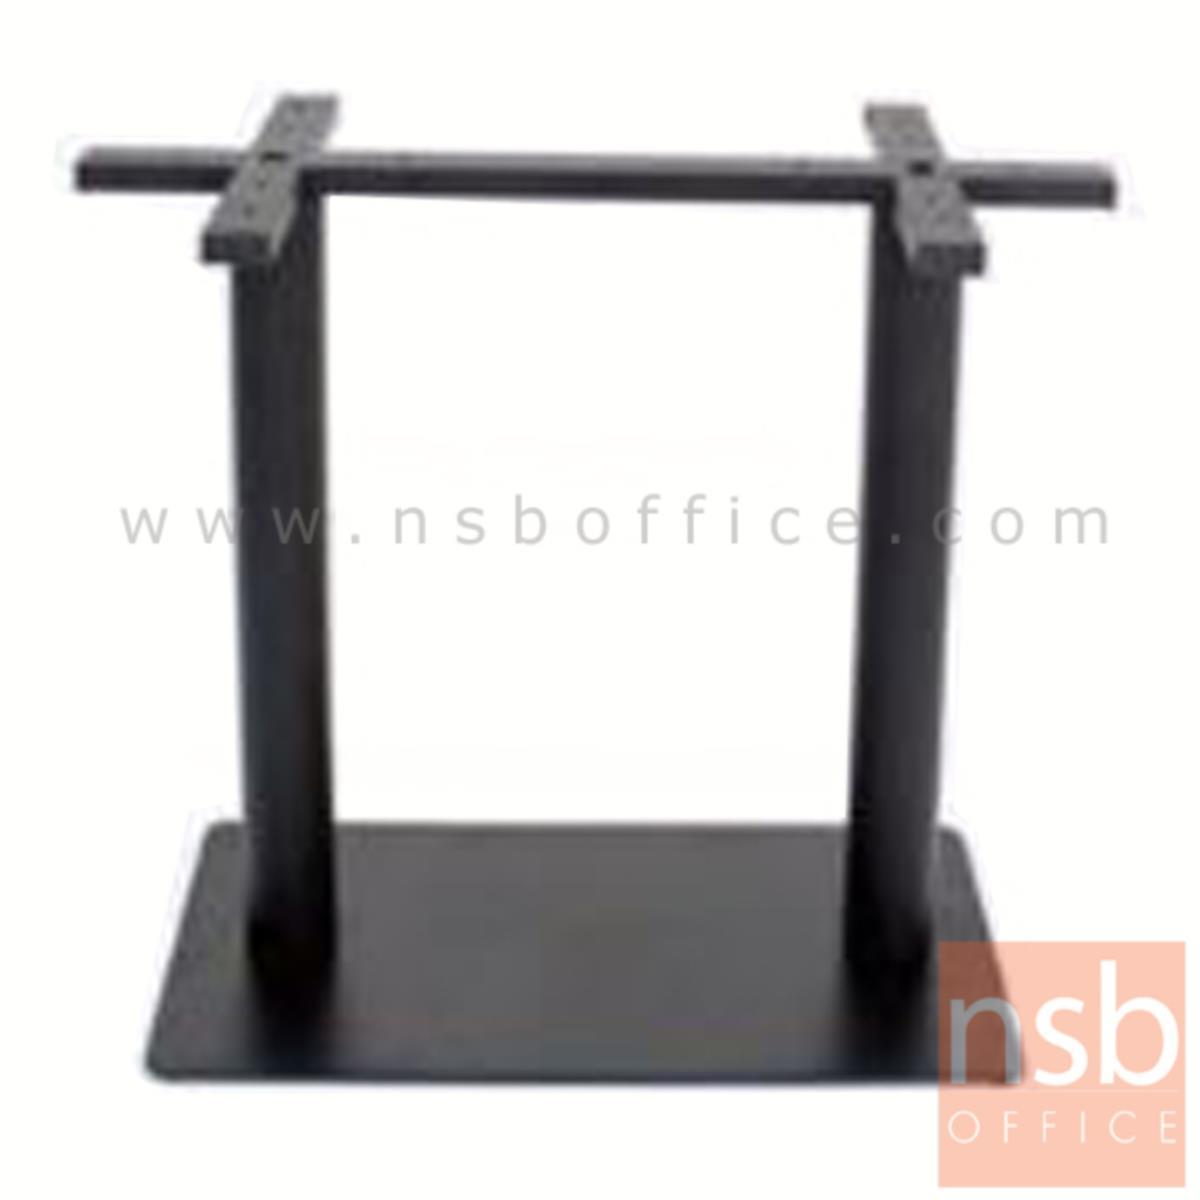 A14A215:ขาโต๊ะบาร์ รุ่น H-ICF65  ขาแผ่นเรียบ